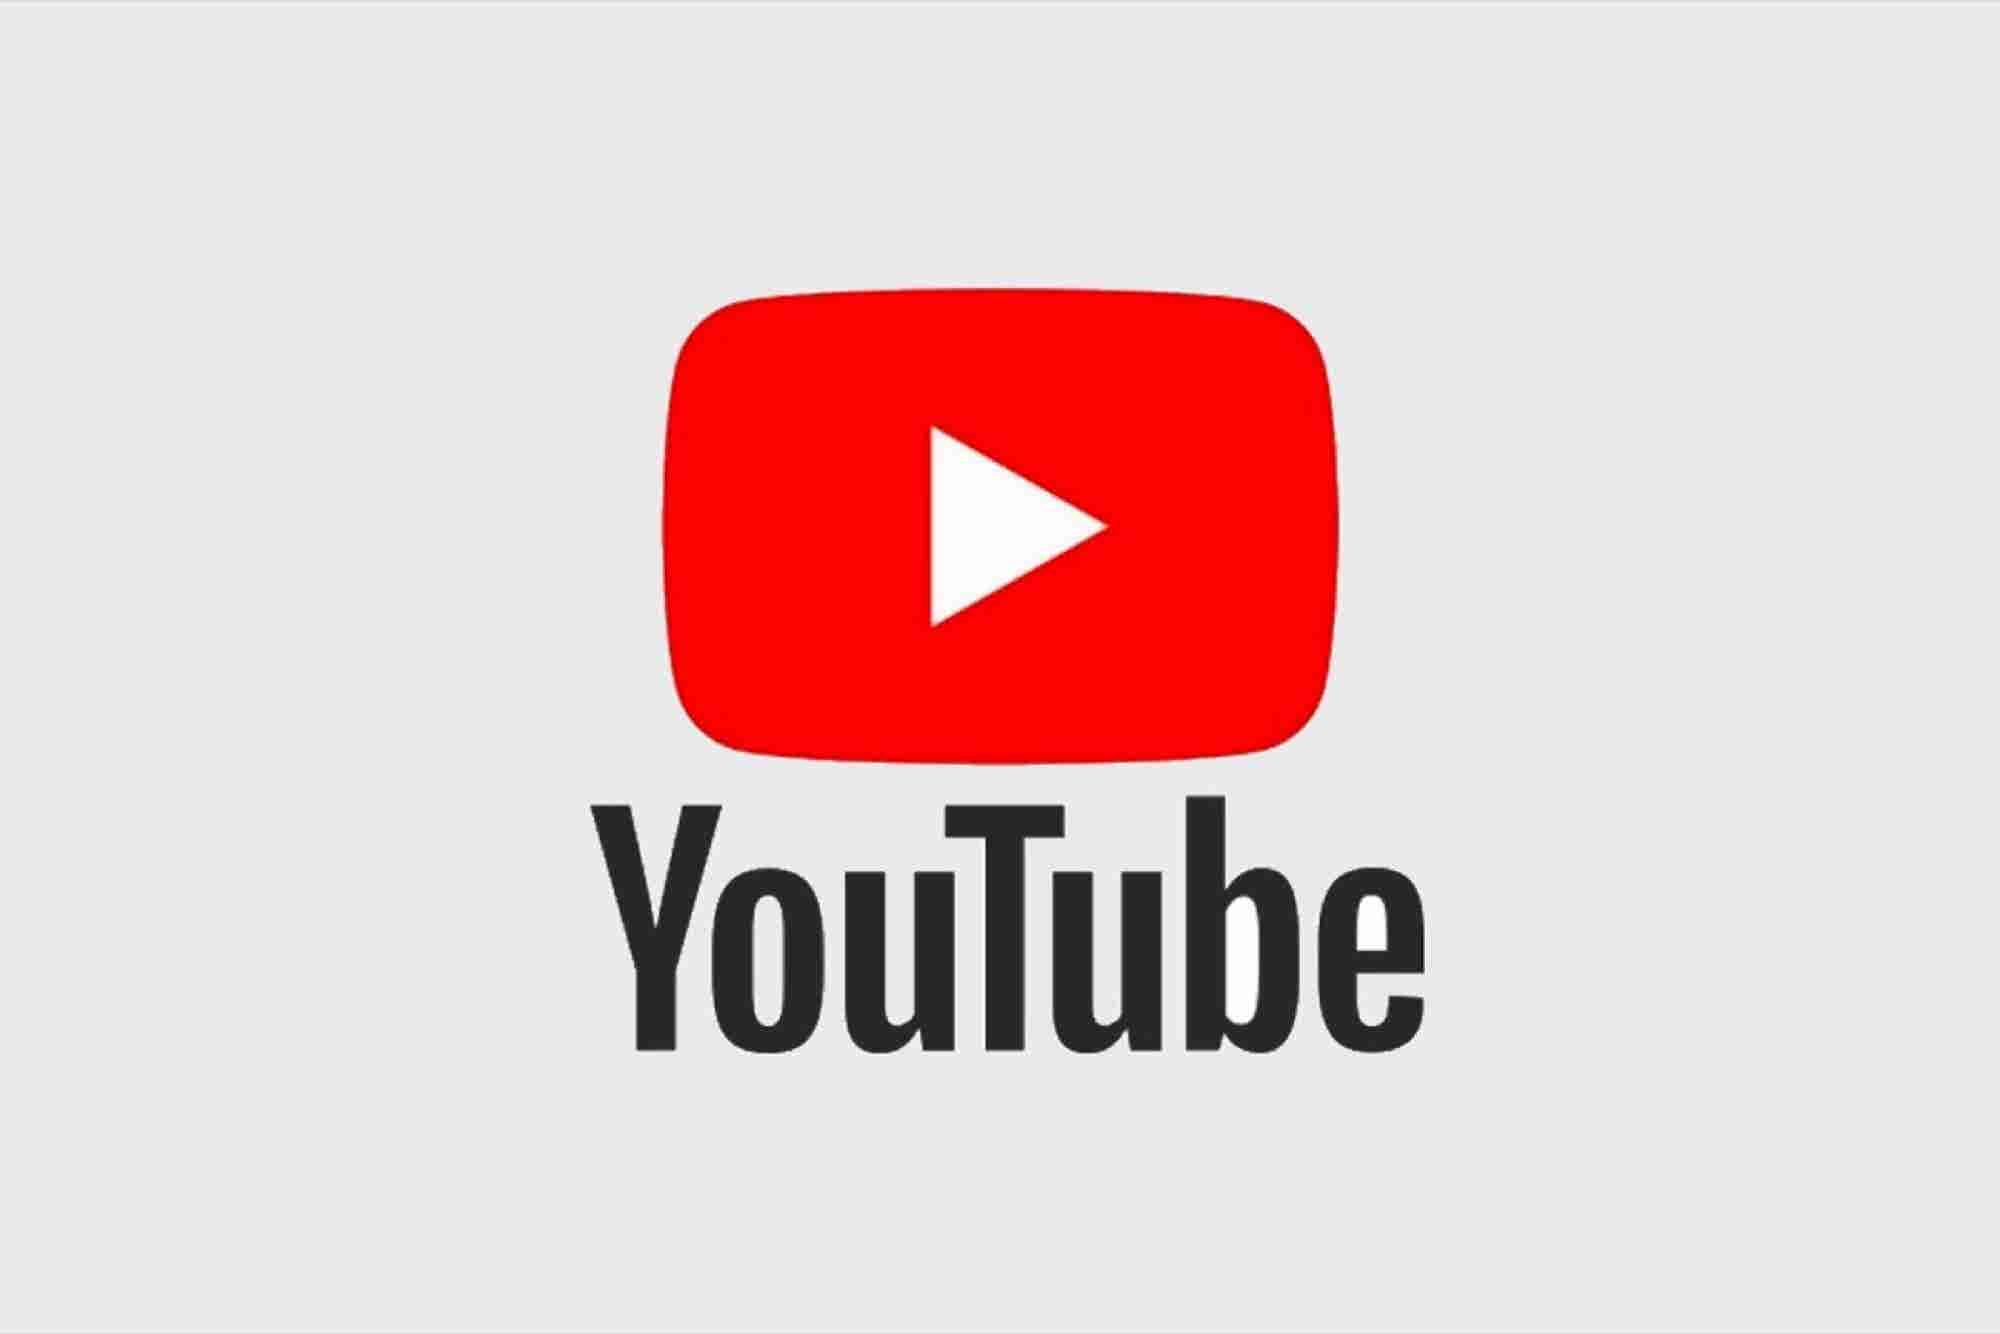 Making Money on YouTube Just Got Much Harder